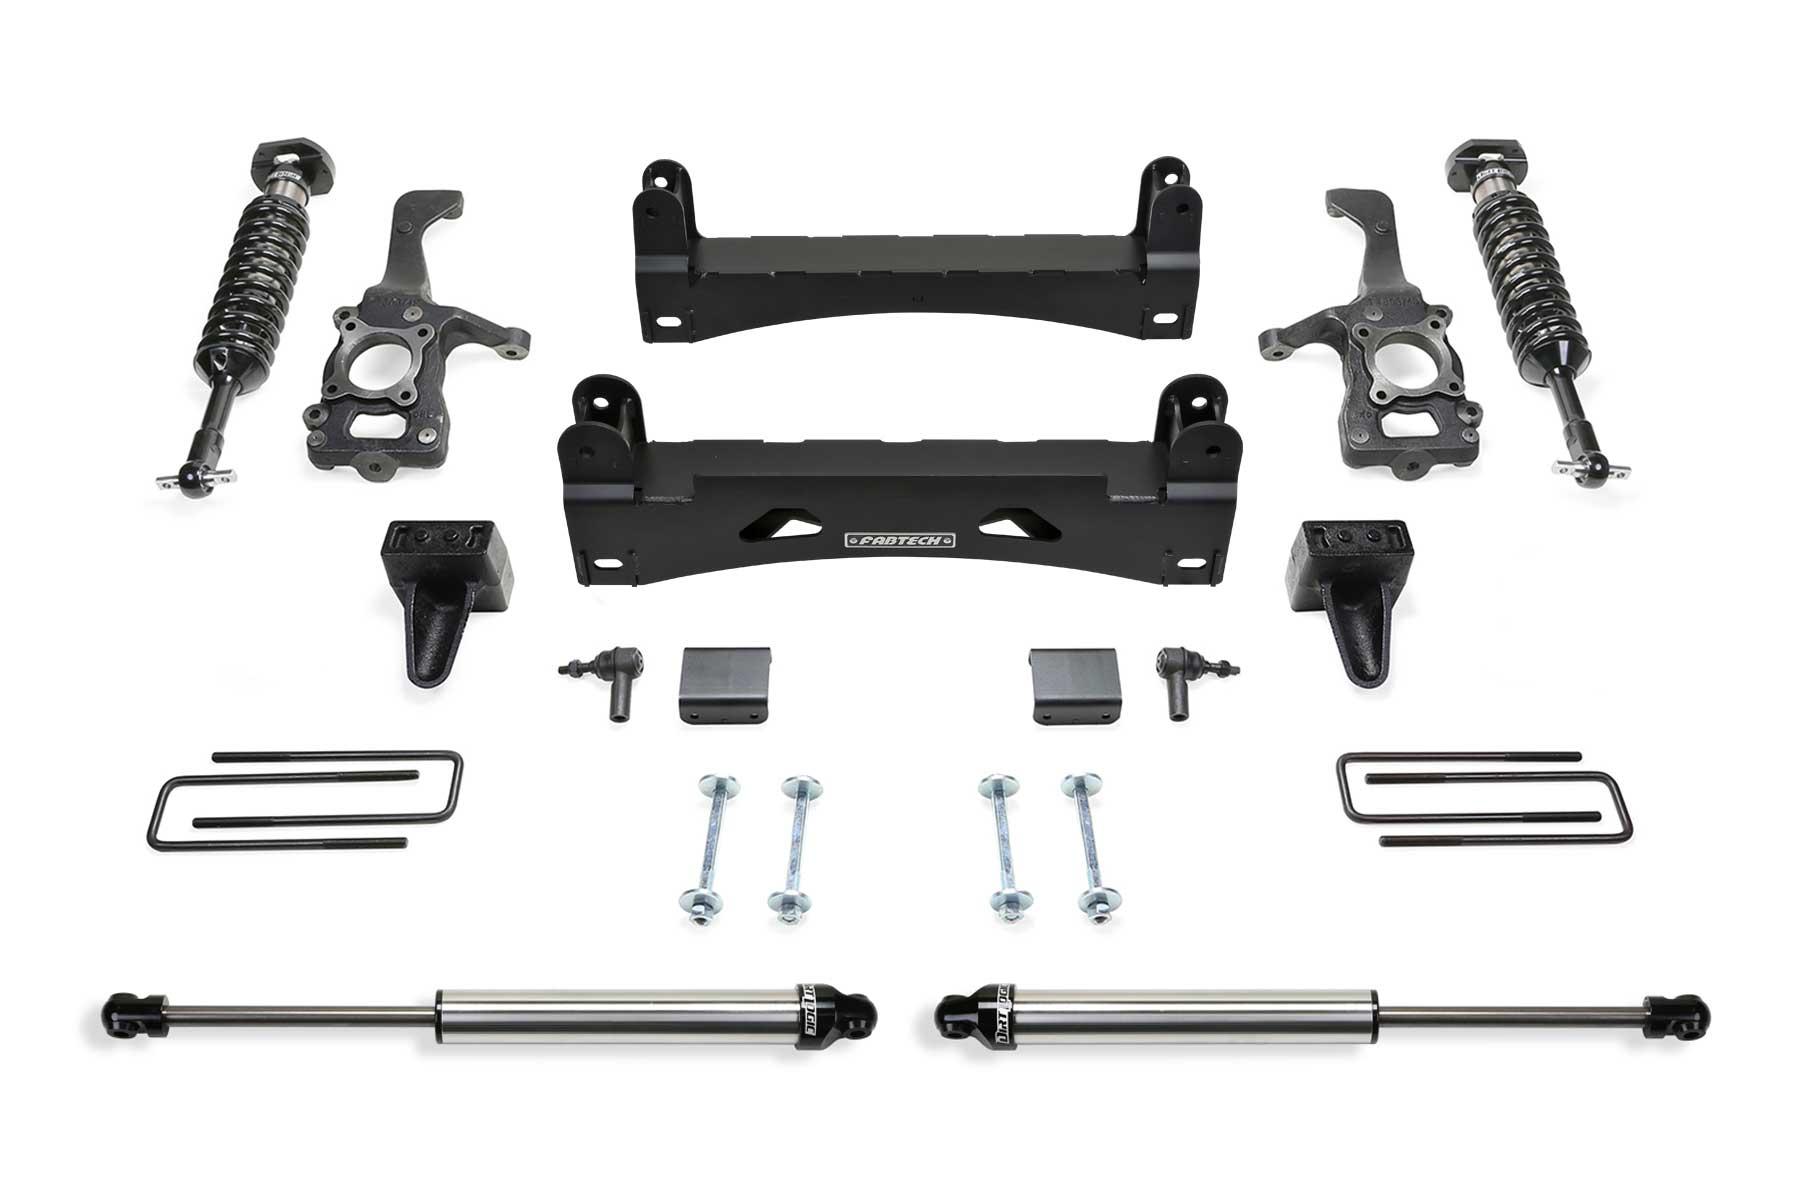 "6"" Performance System w/ Front Dirt Logic 2.5 Coilovers & Rear Dirt Logic  2.25 Shocks - K2249DL | Fabtech"